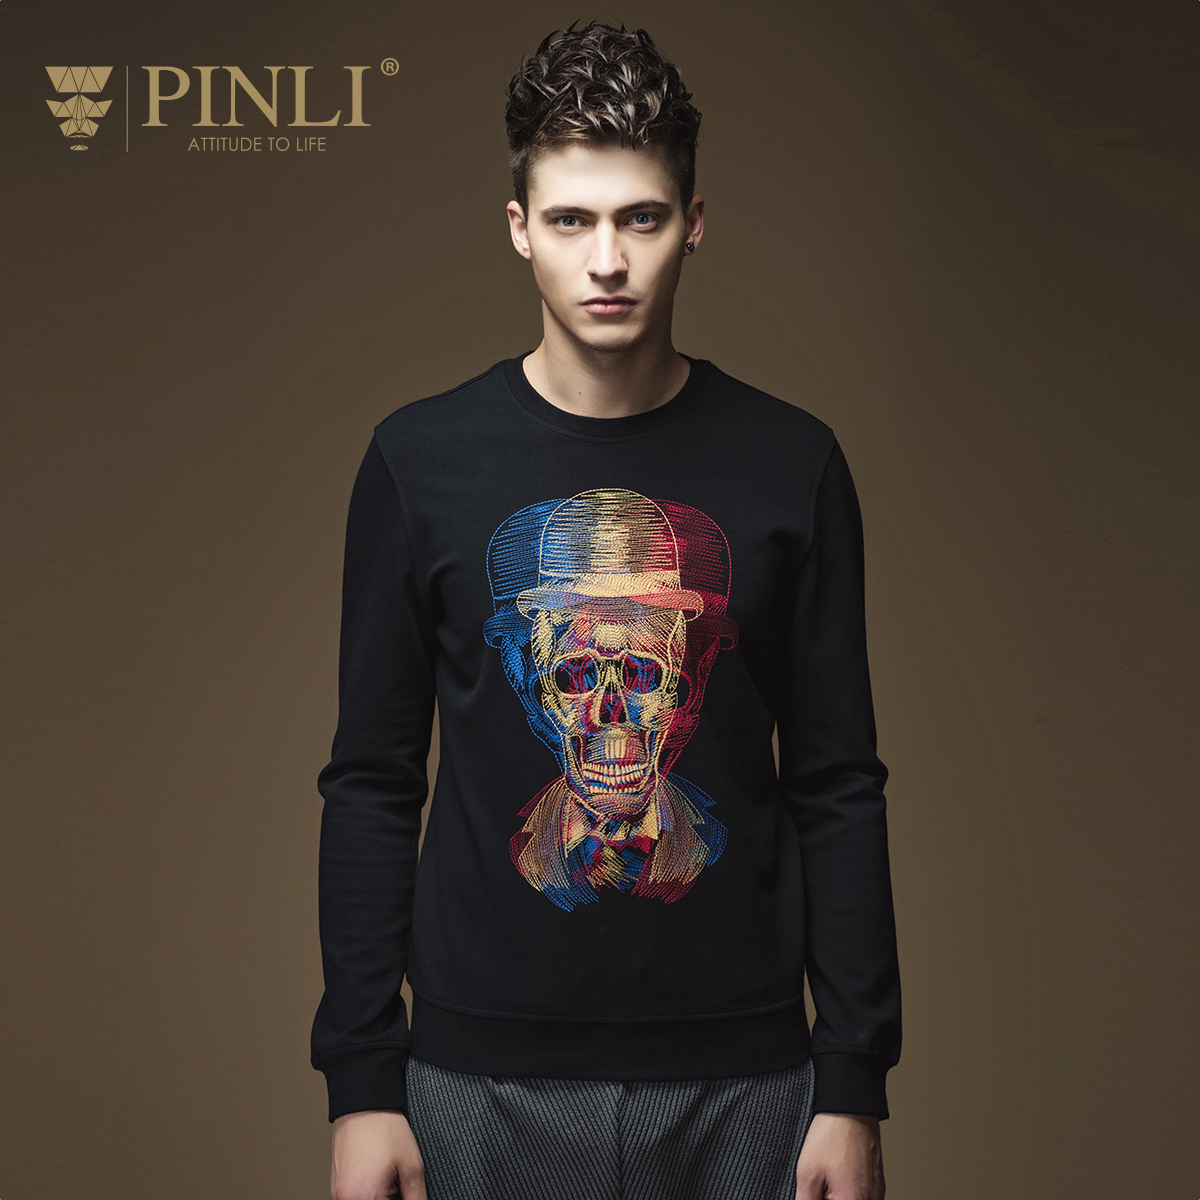 Suéter real o-cuello pullover hombres pinli 2016 otoño nueva llegada ropa  de hombre delgado suéter bordado masculino B16320422 52779c3e049e